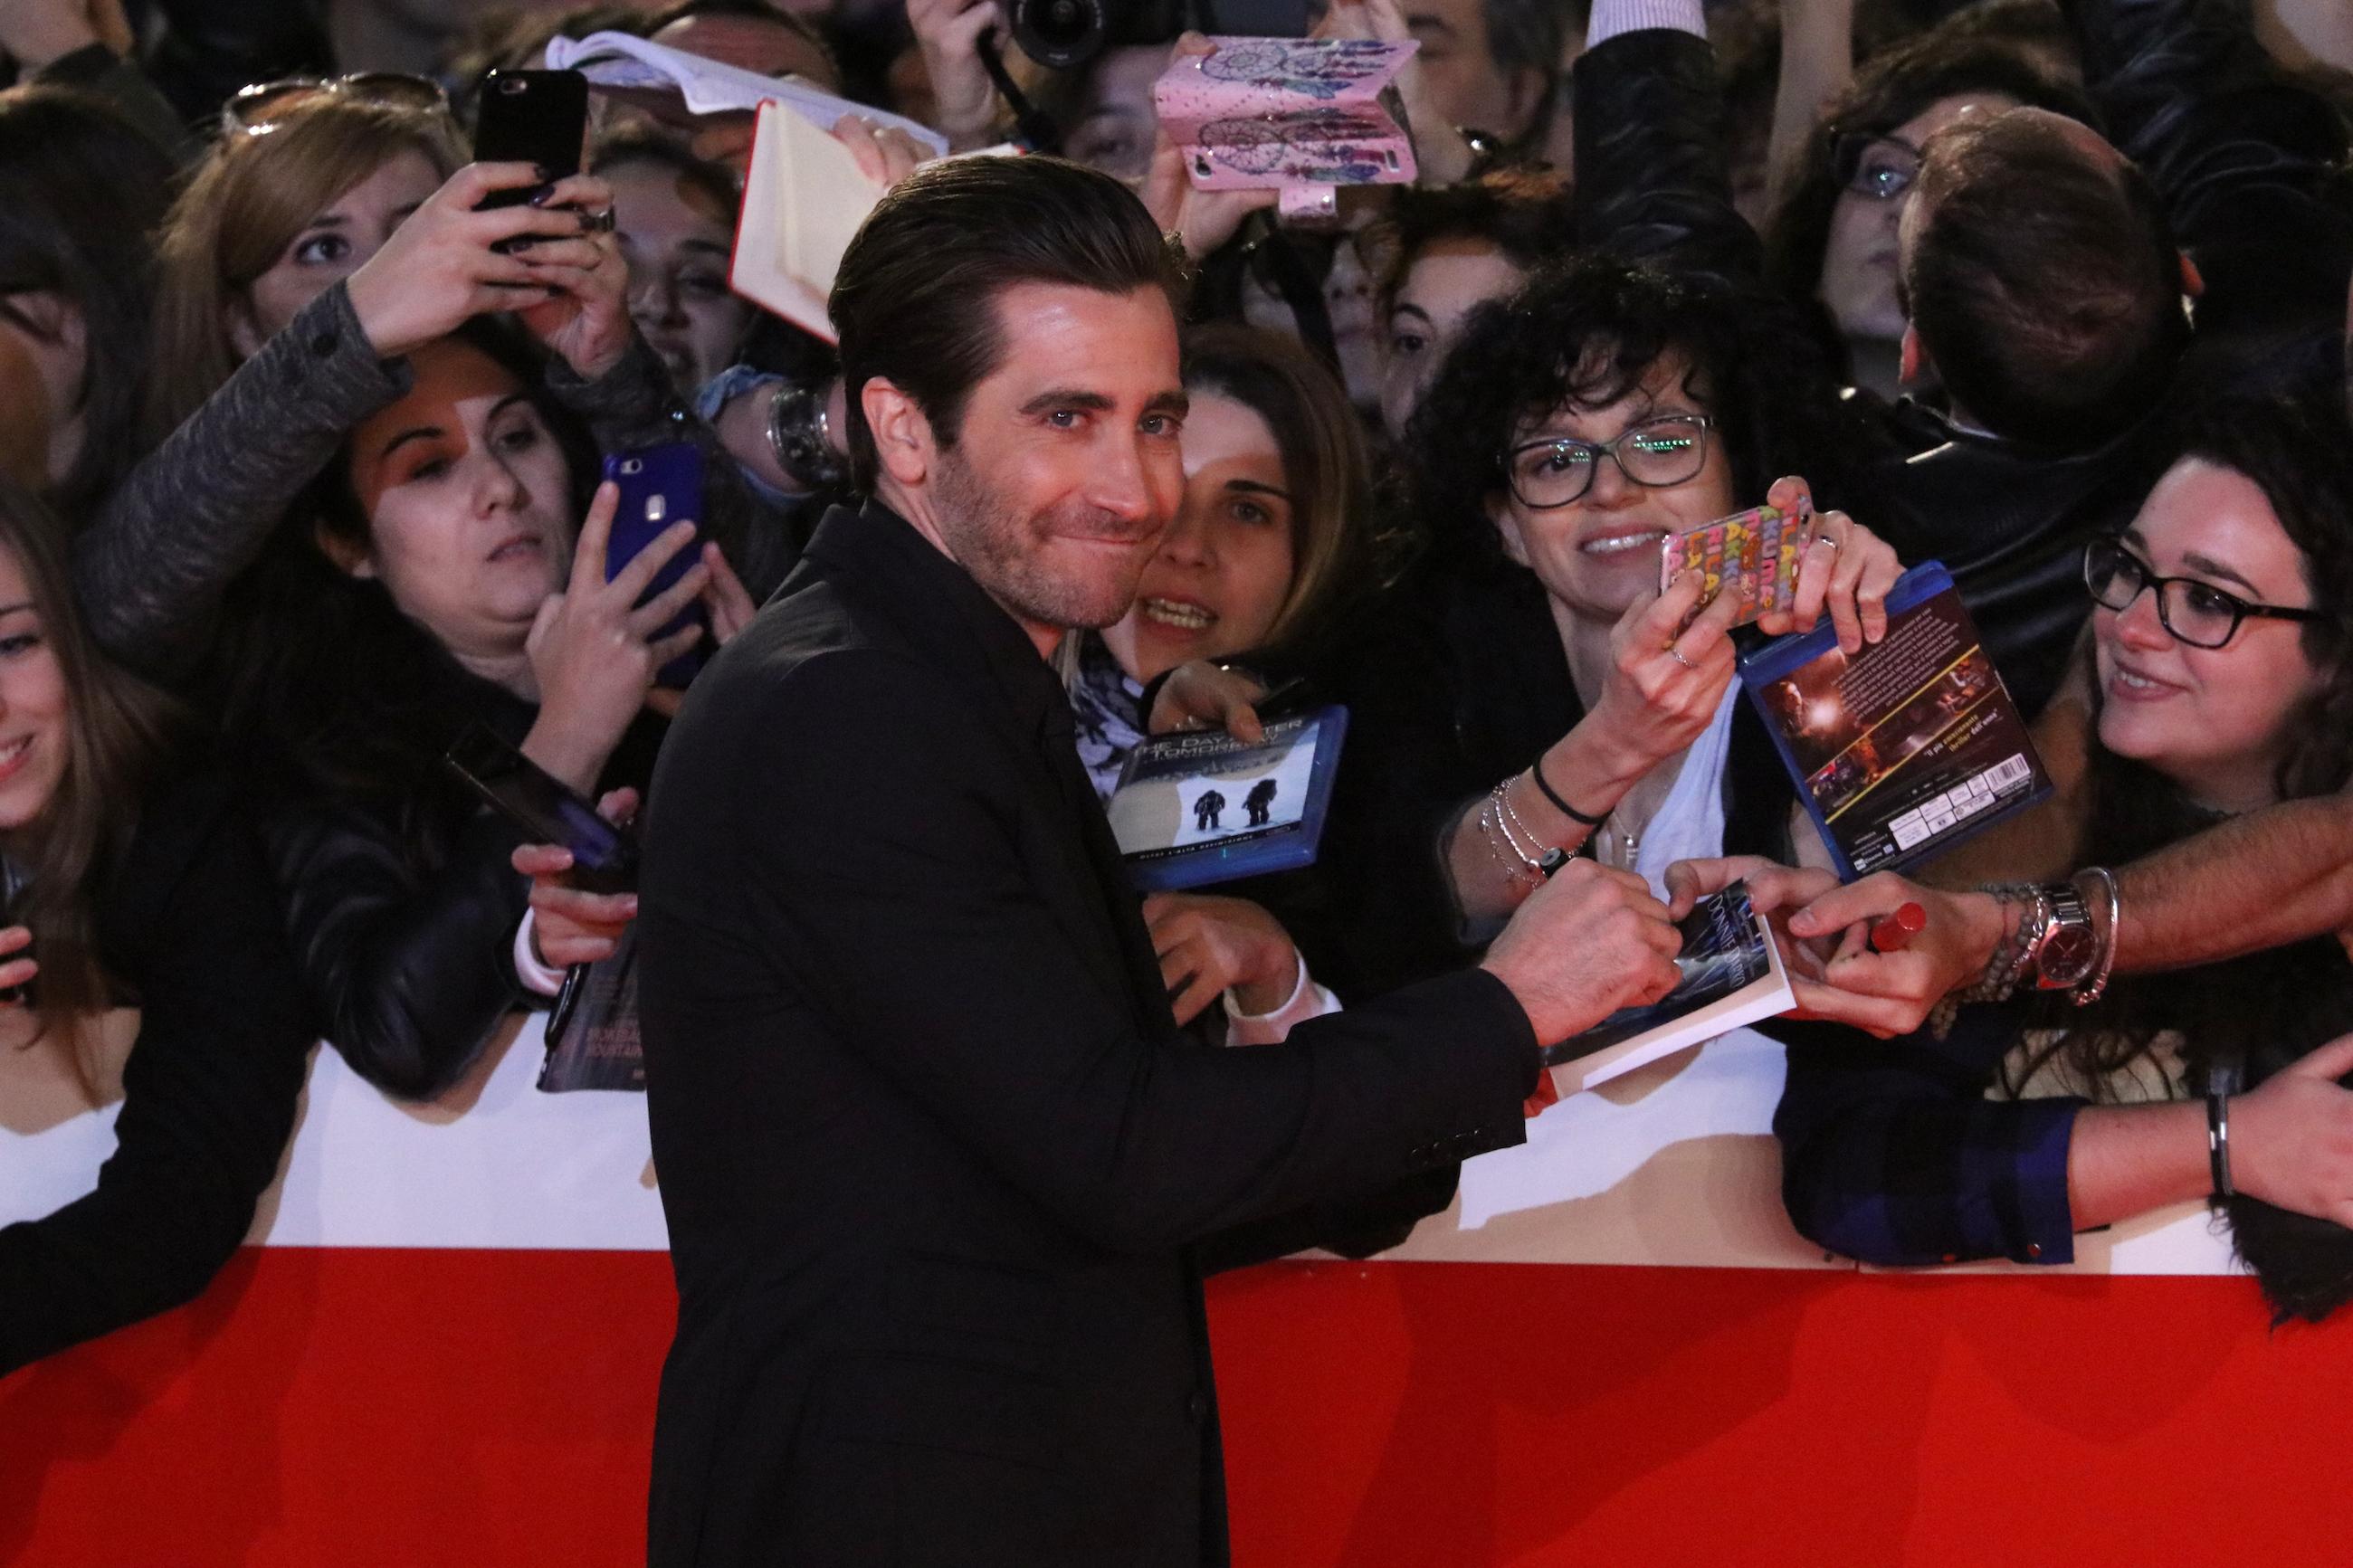 Roma 2017: Jake Gyllenhaal firma autografi sul red carpet di Stronger